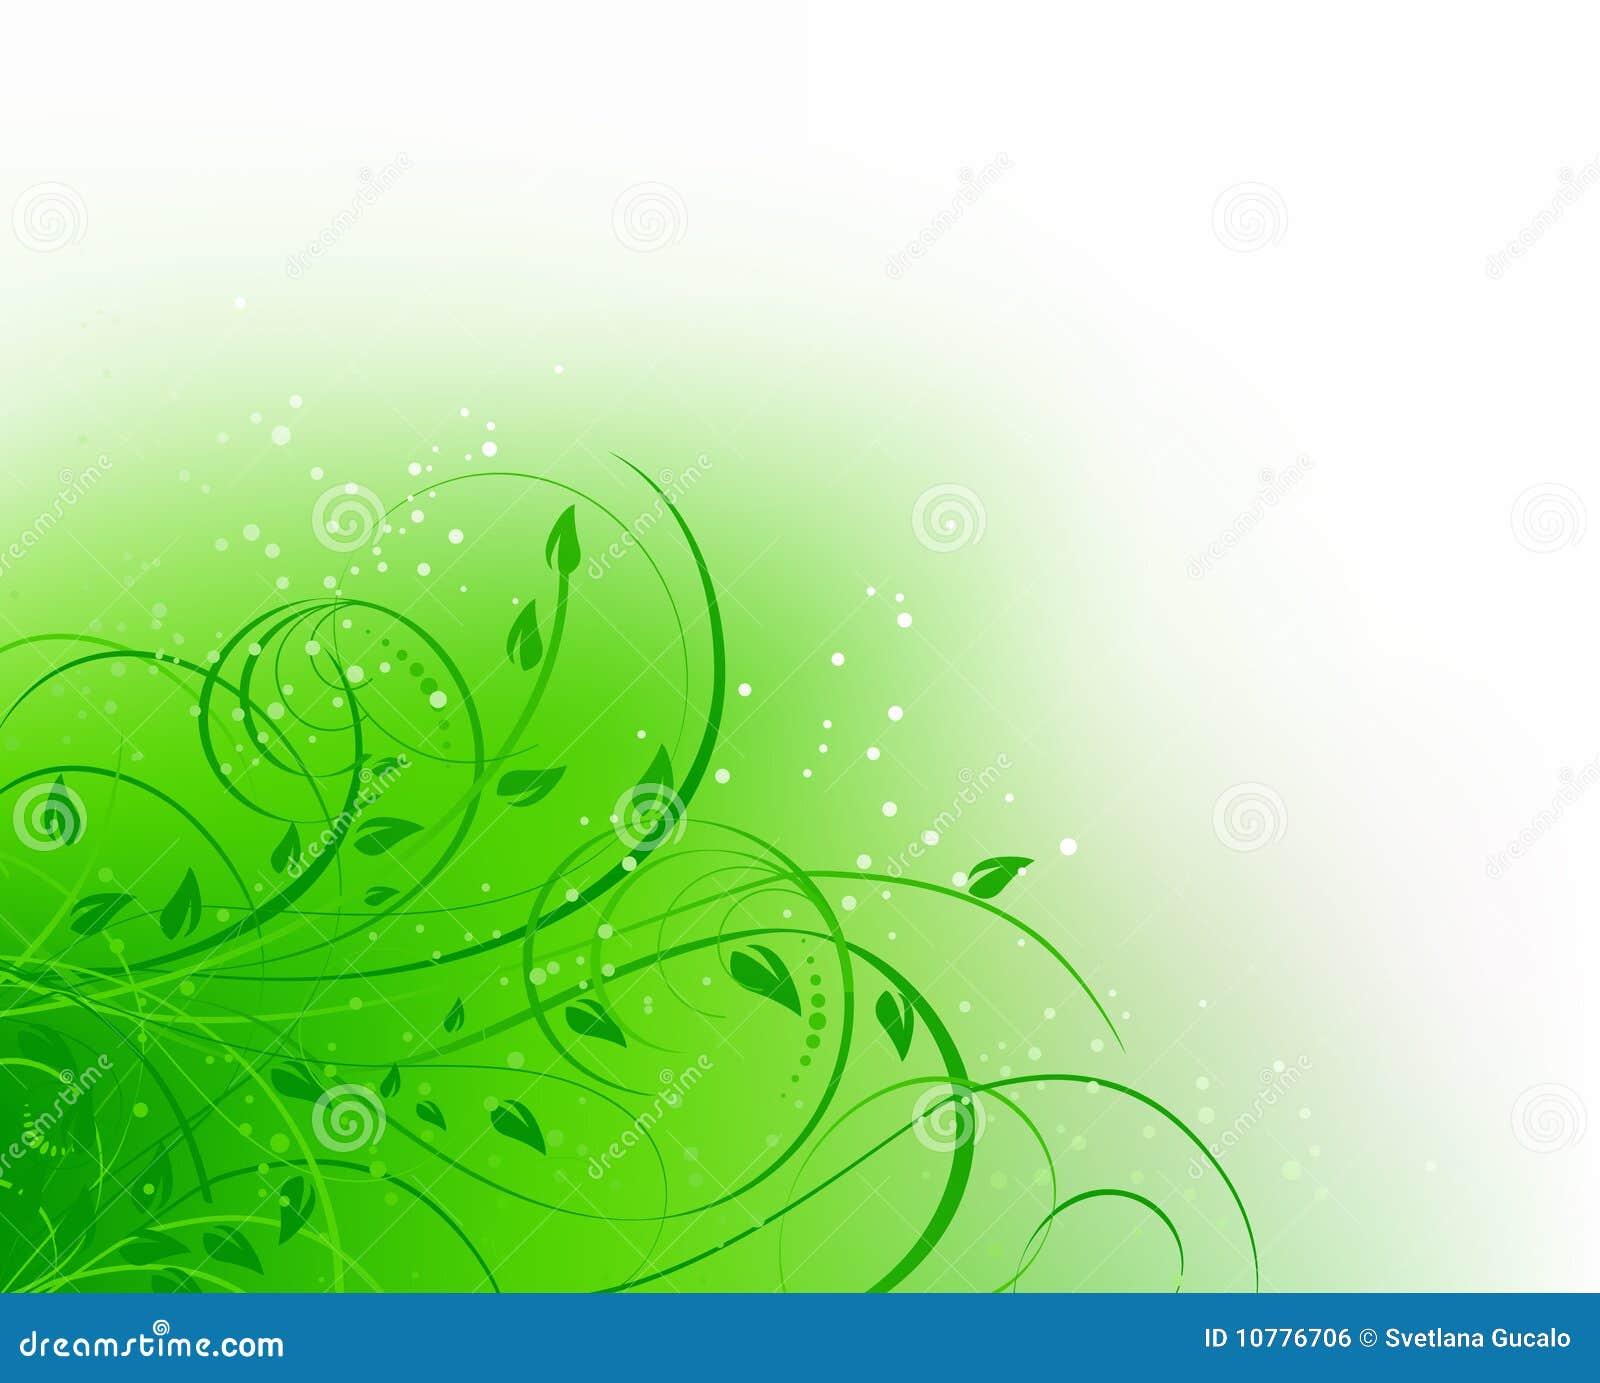 Groene bloemen abstracte kromme